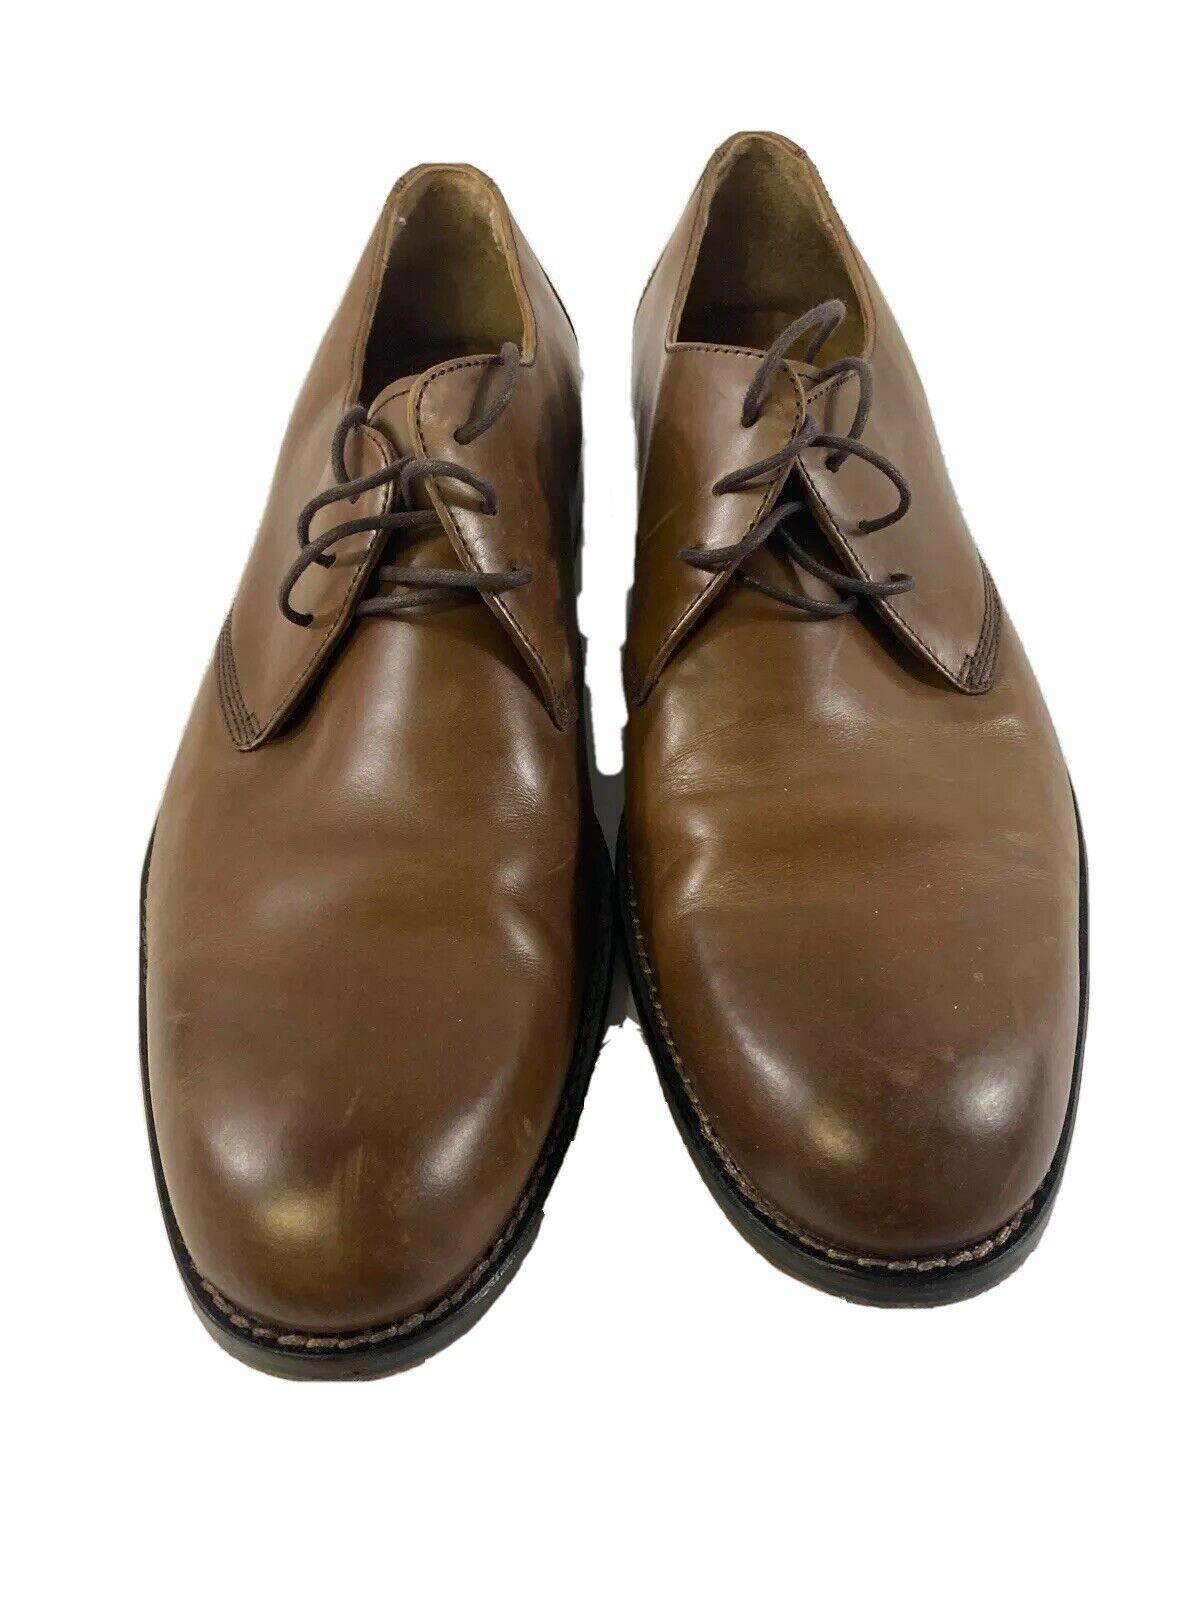 Johnston & Murphy Sheepskin Leather Shoes 9.5M Brown Mens 15-1790